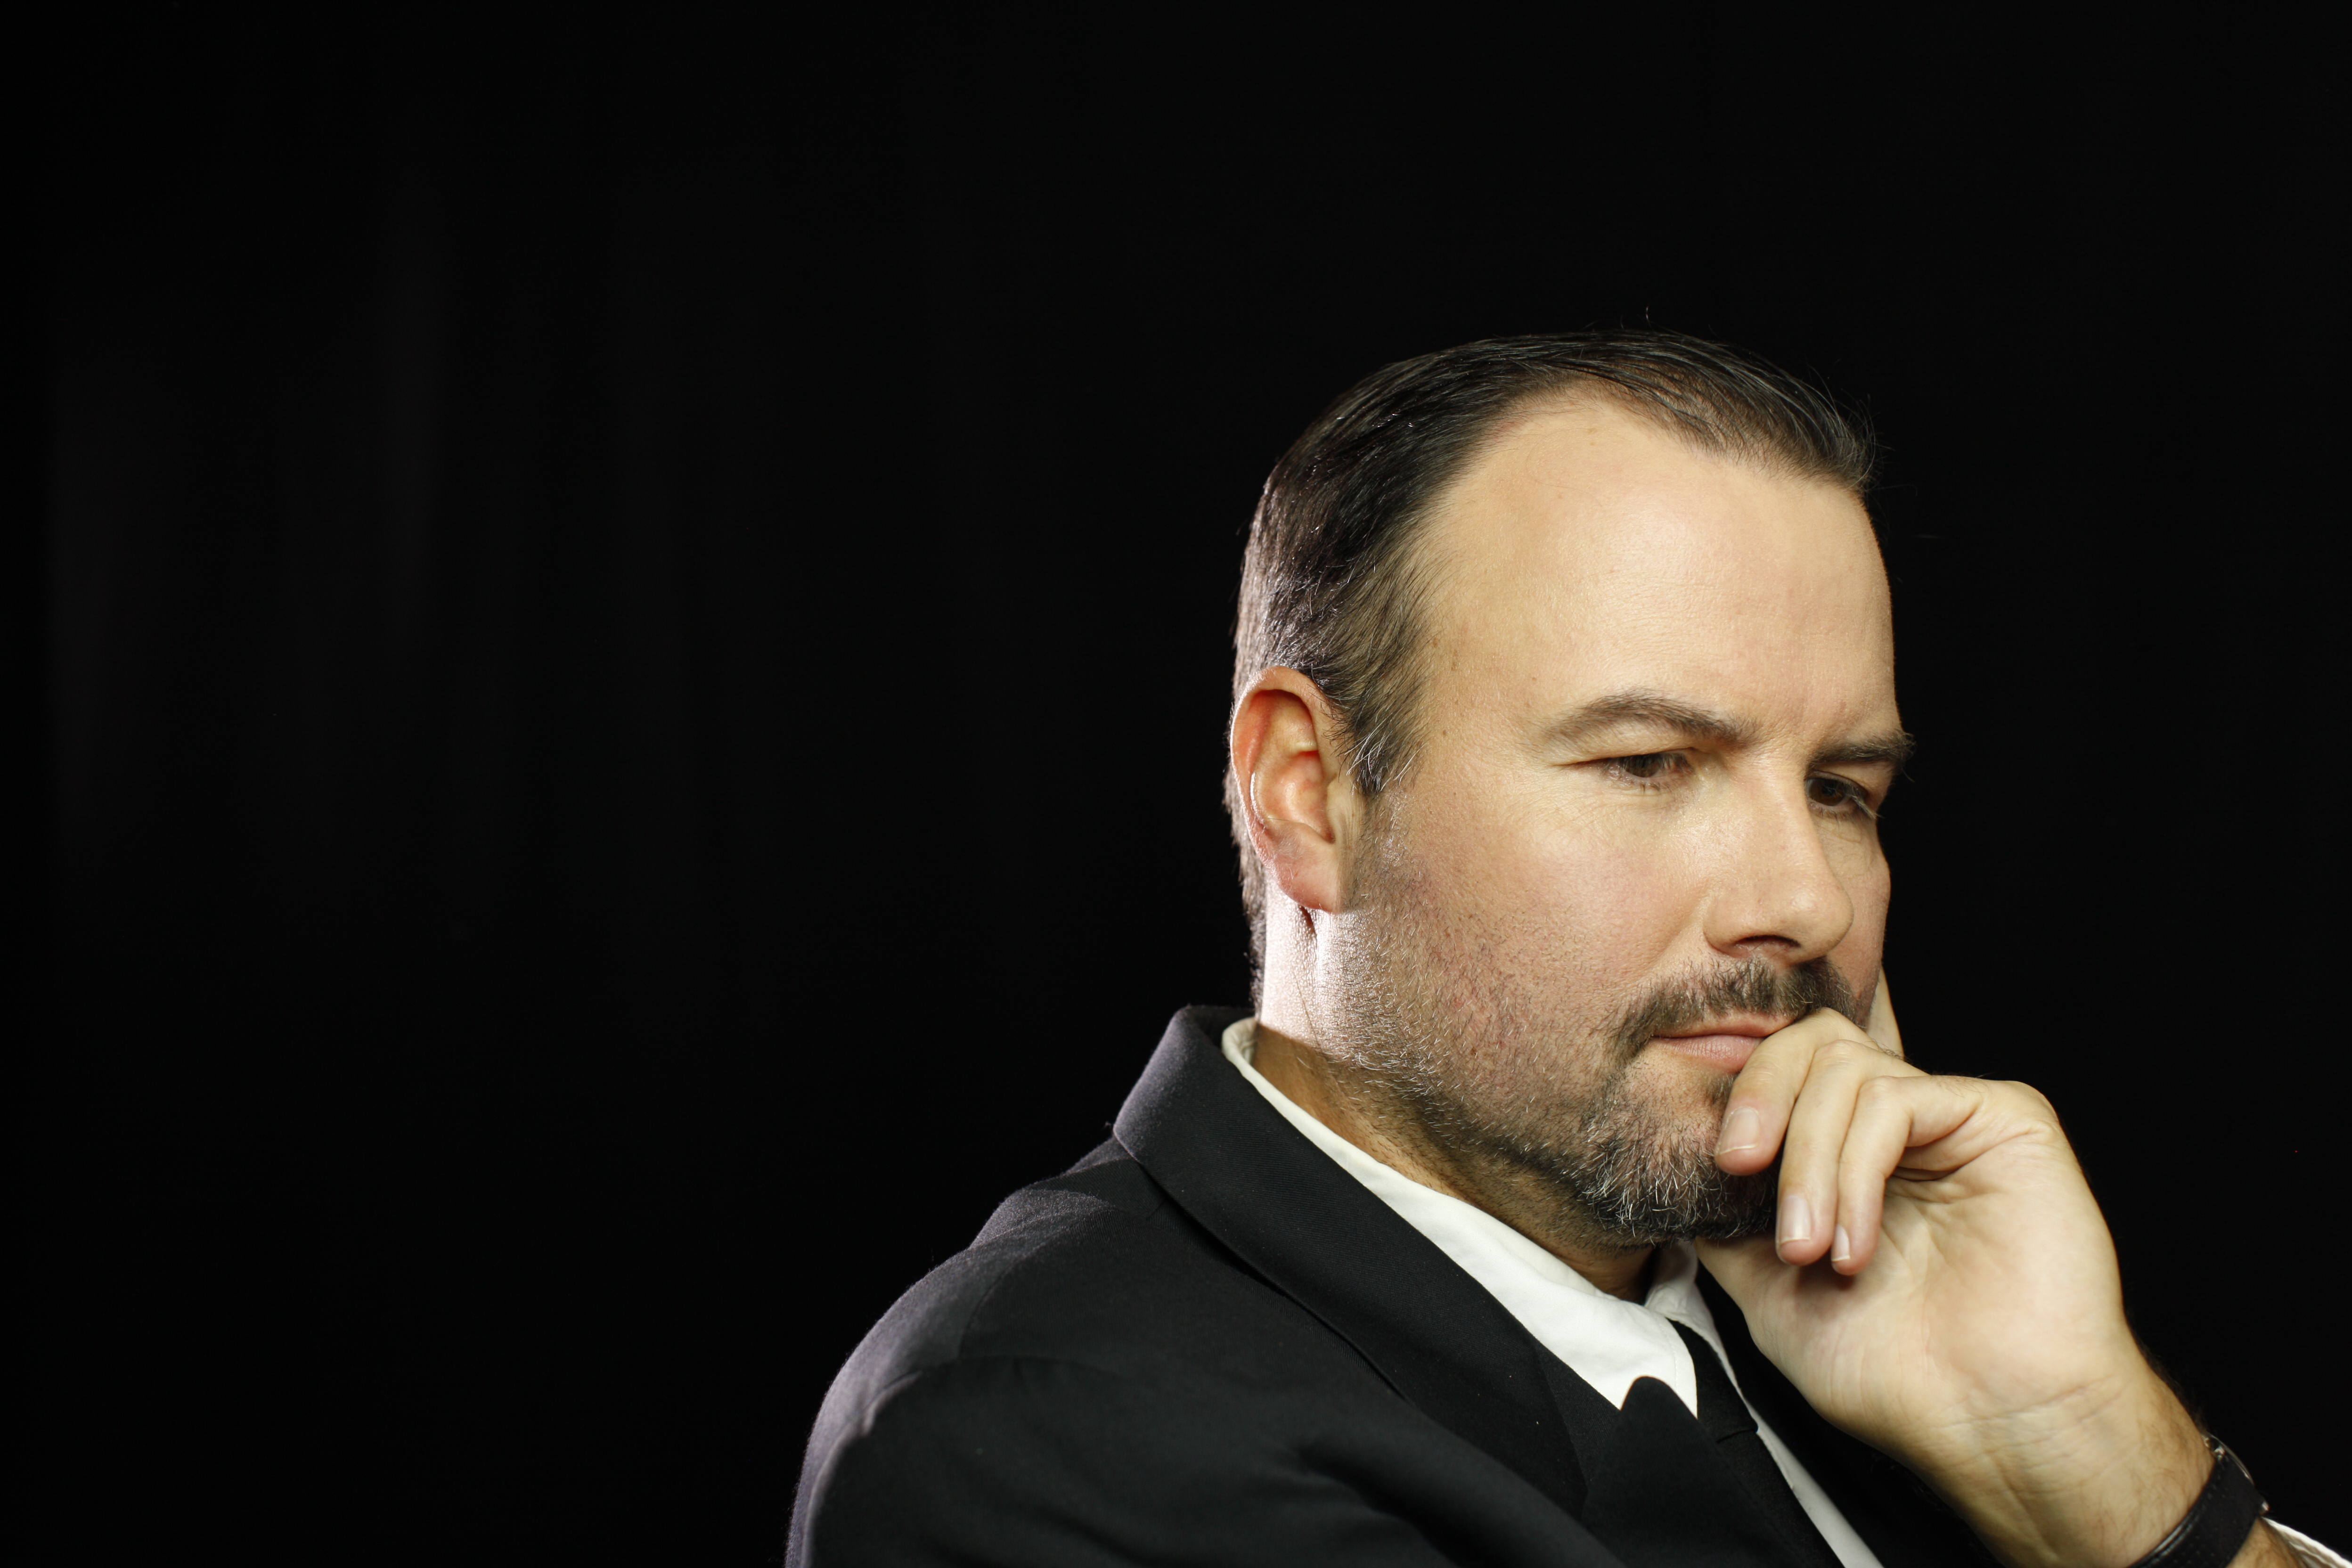 Alexander Jewell-Thomas – Pressewart